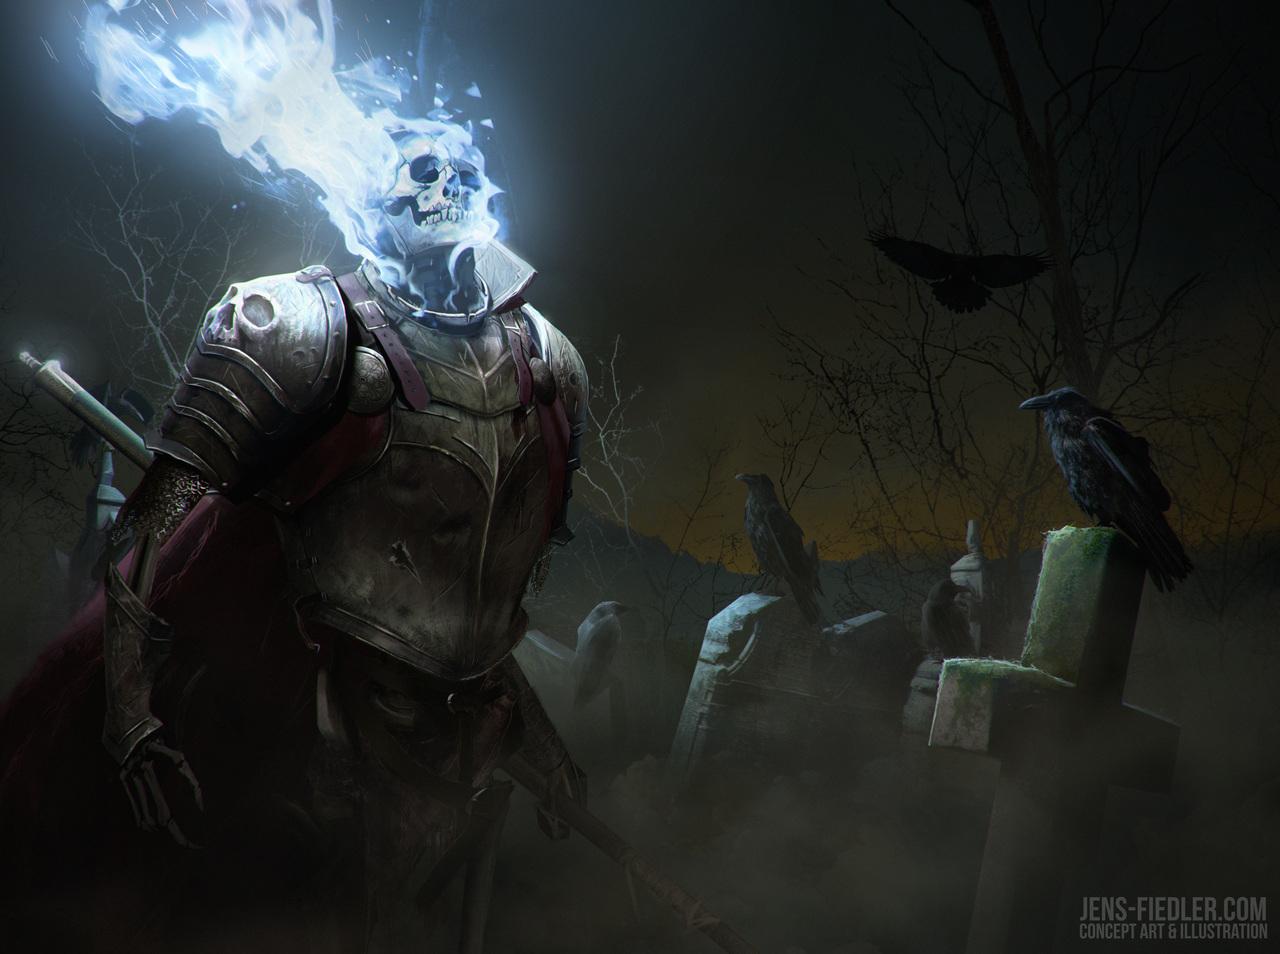 graveyard guard by jensfiedler